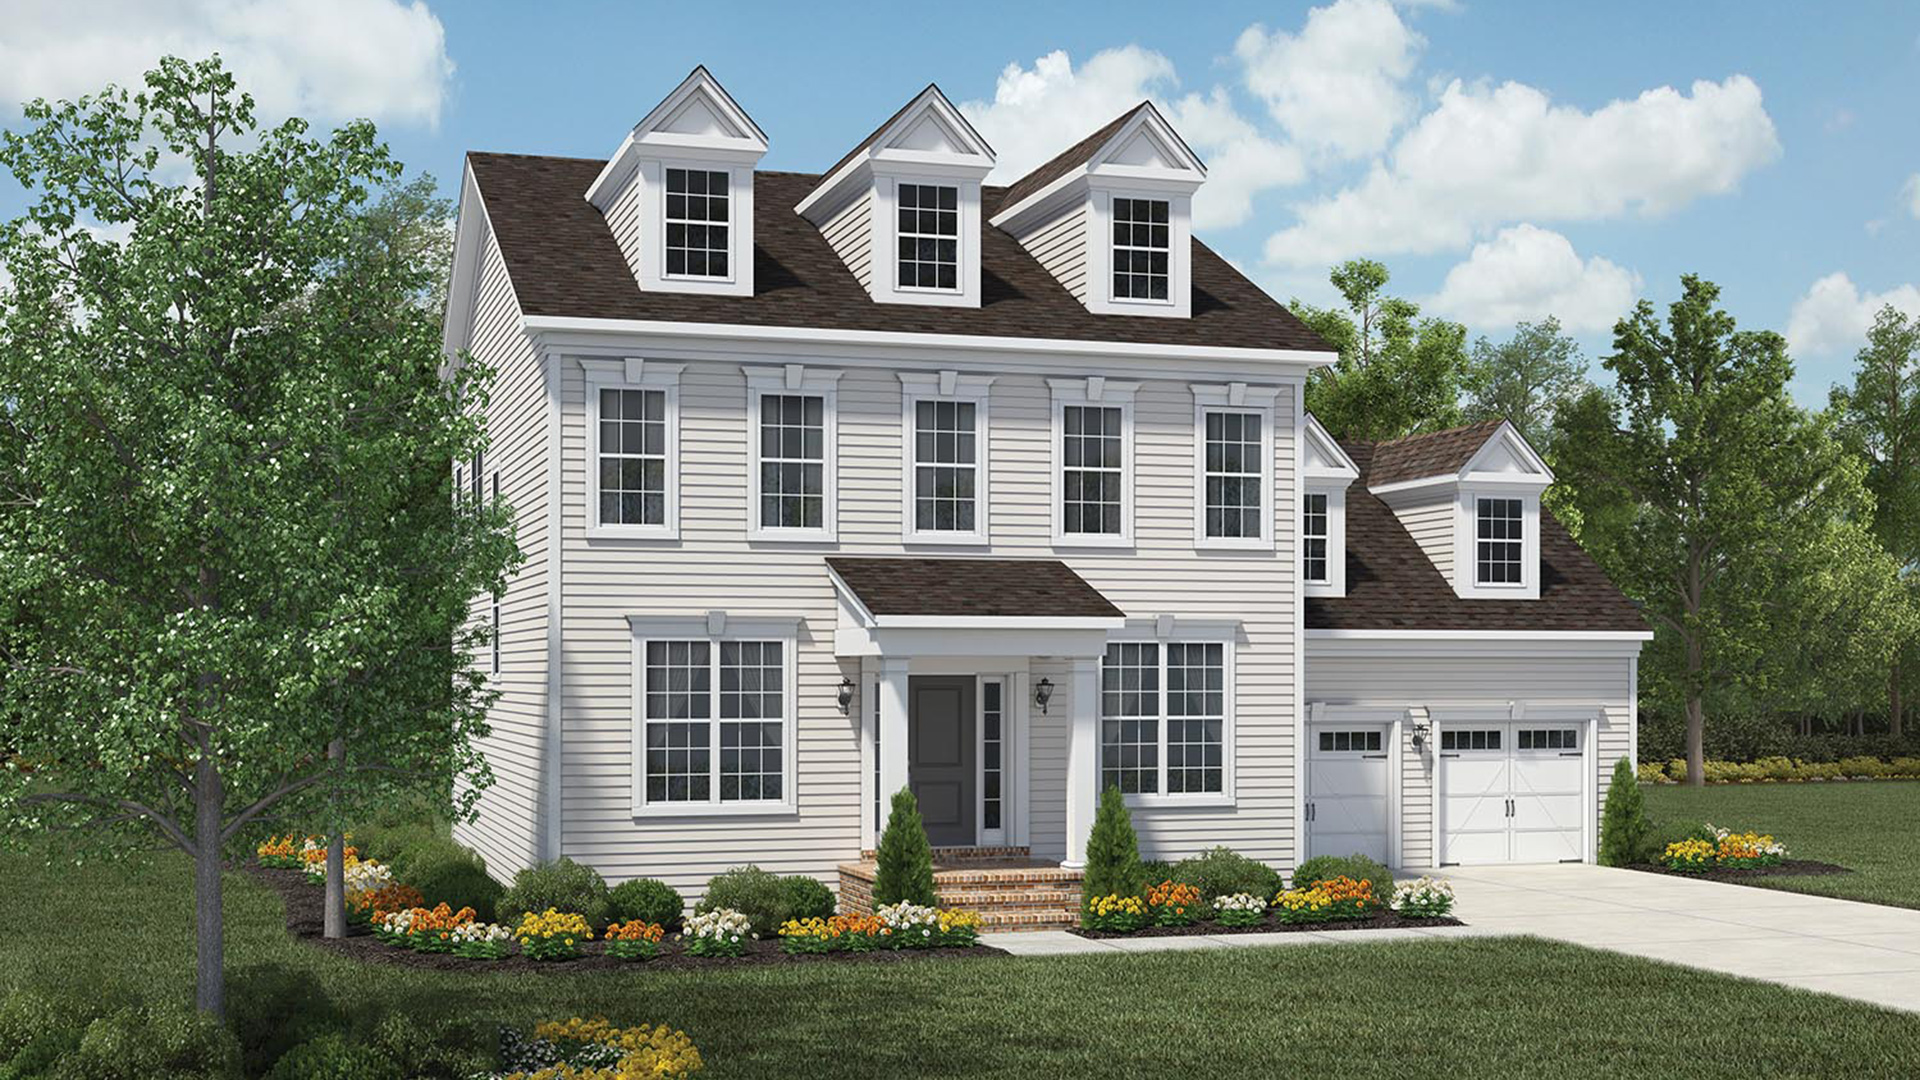 Doylestown greene the parker home design for Parker house designs